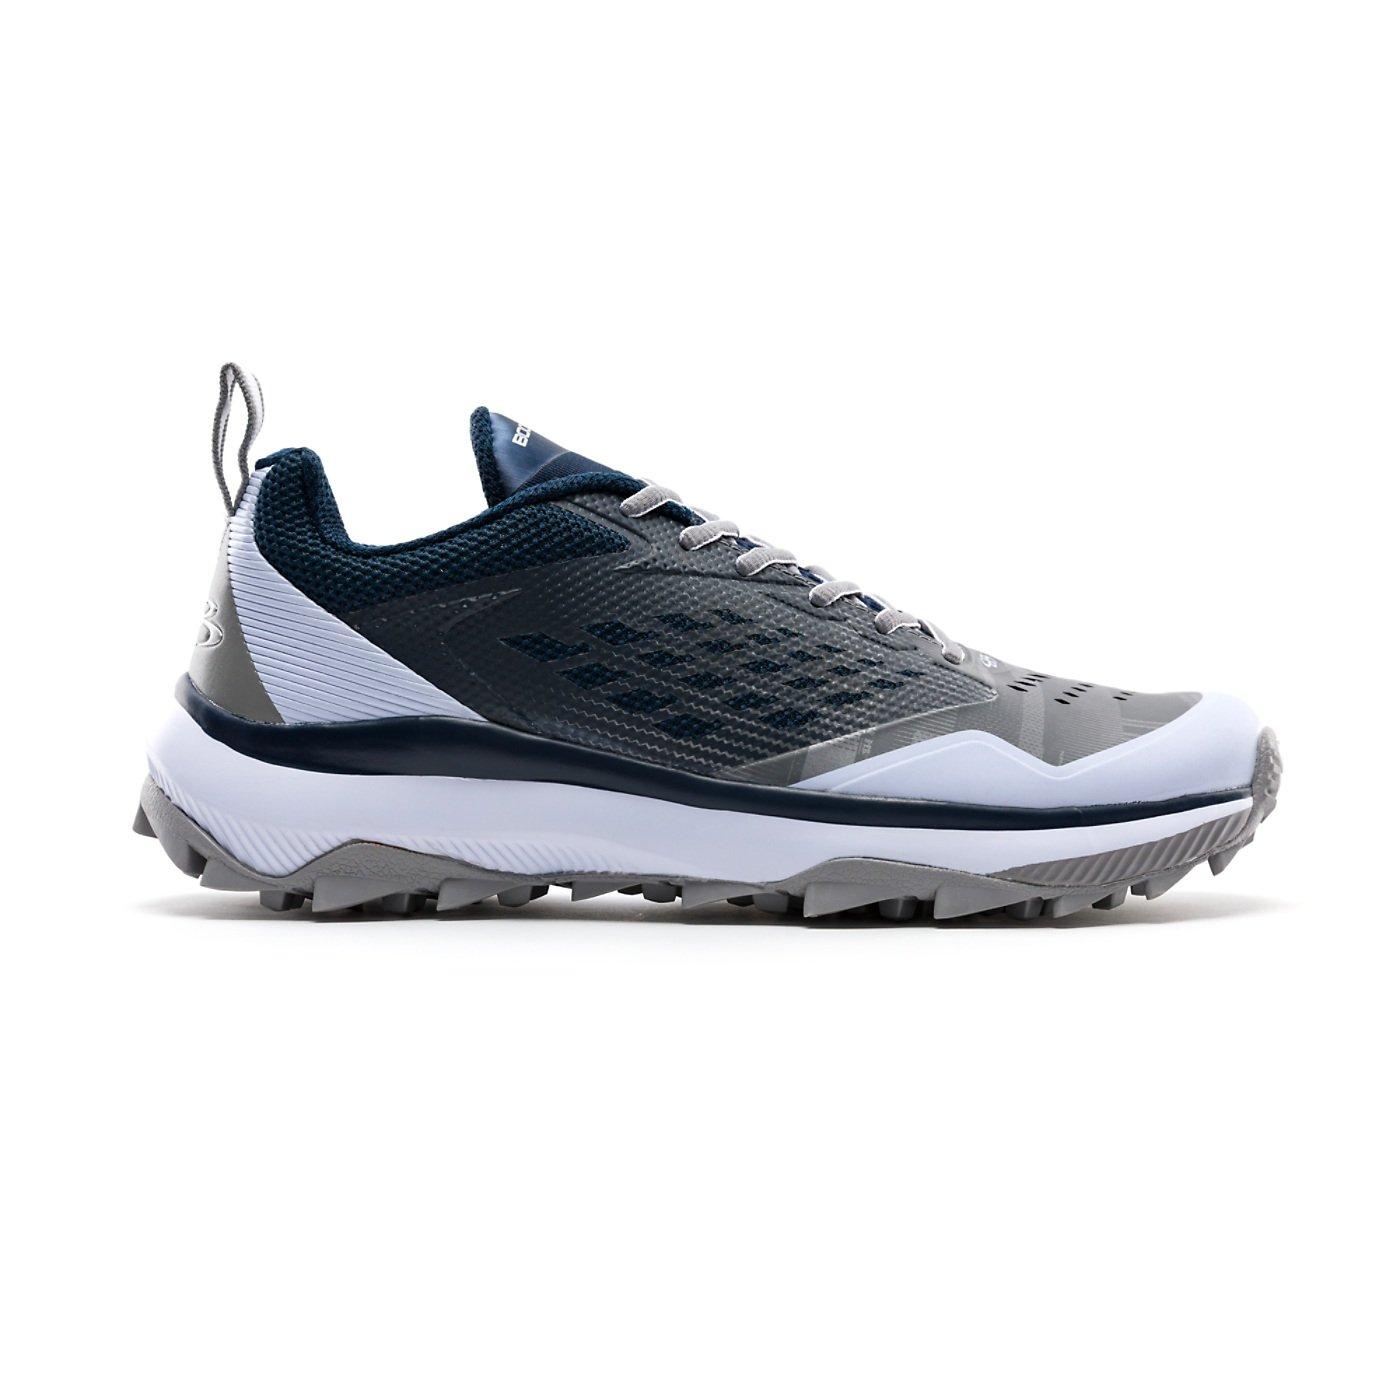 Boombah Men 's Marauder Turf Shoes – 8カラーオプション – 複数のサイズ B07C9K8MGY 9 ネイビー/グレー